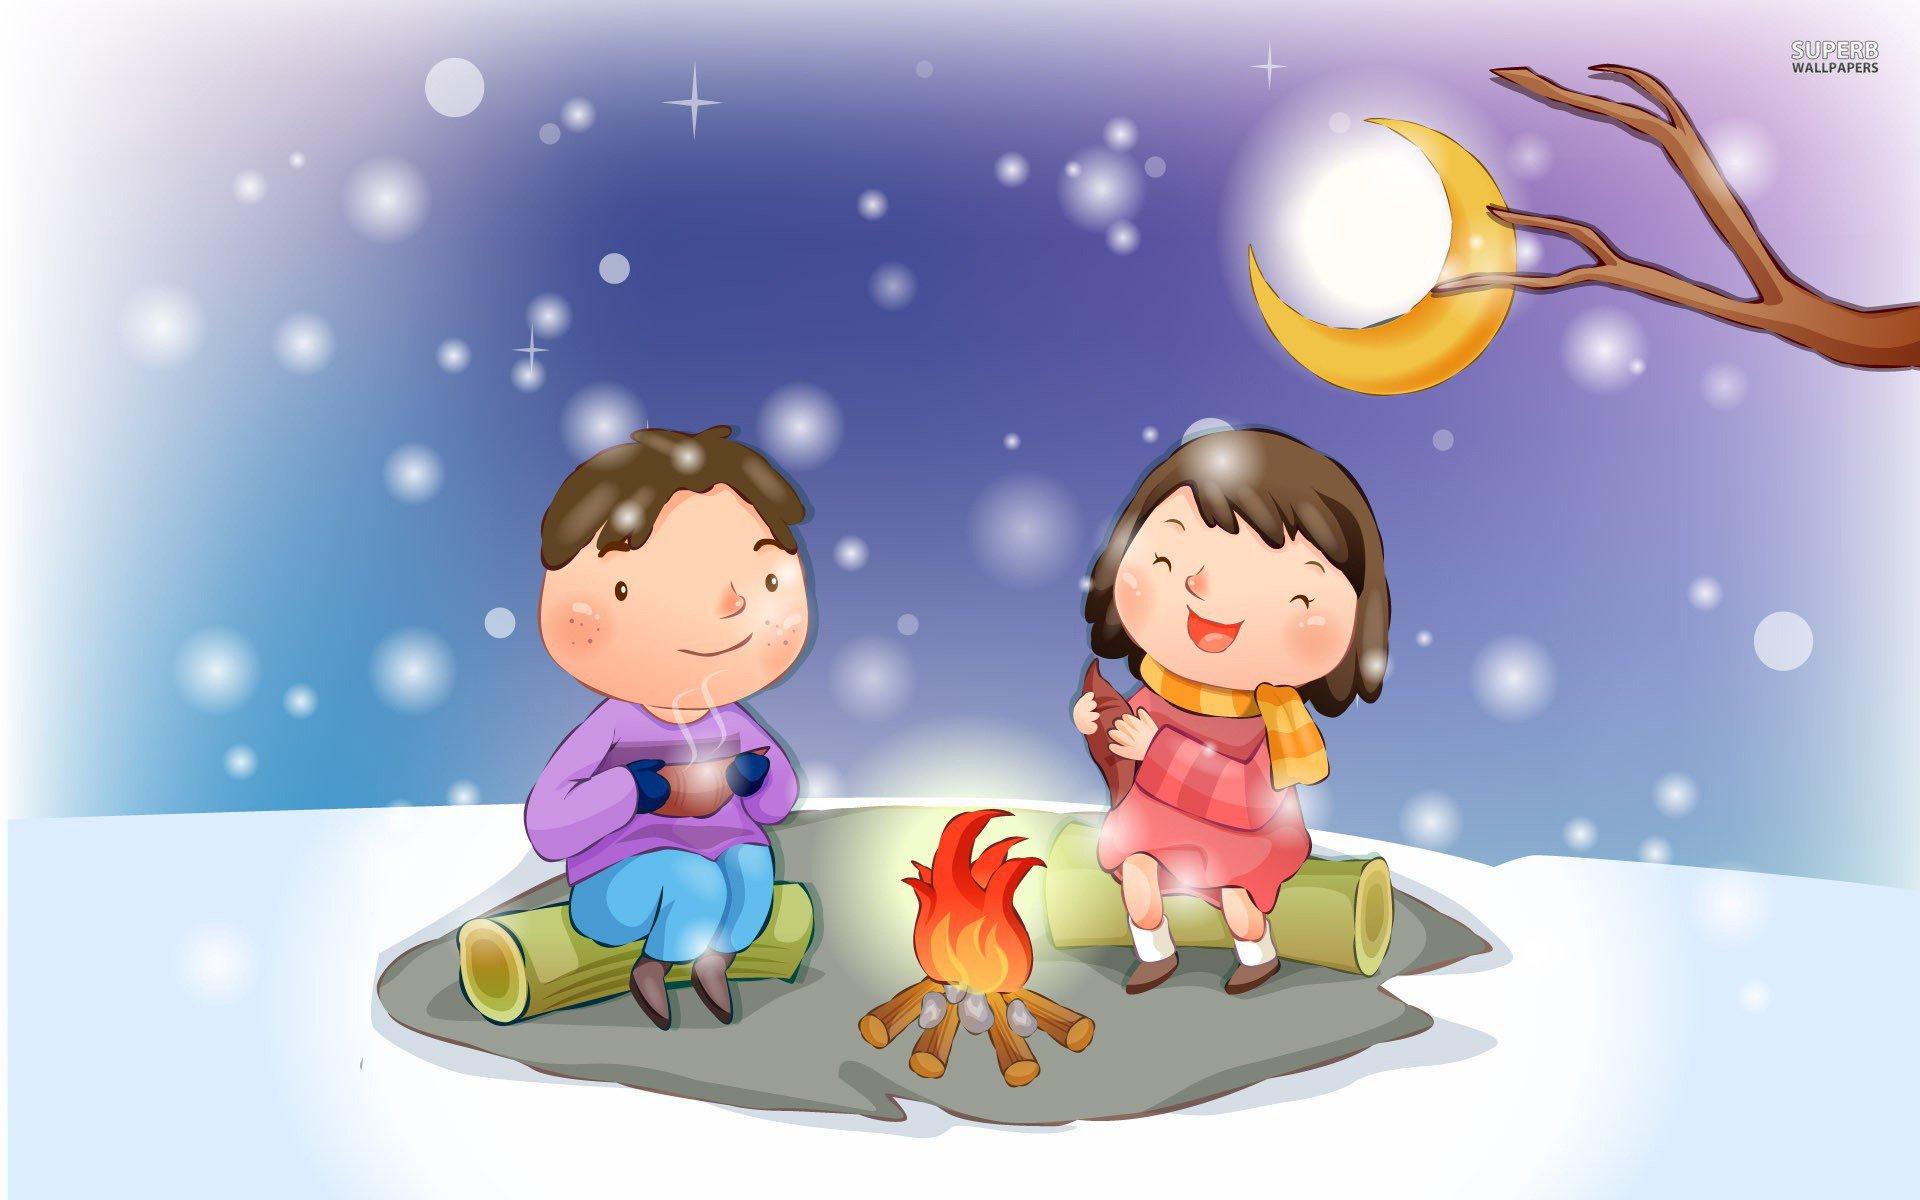 Bonfire clipart kid. In the snow walldevil